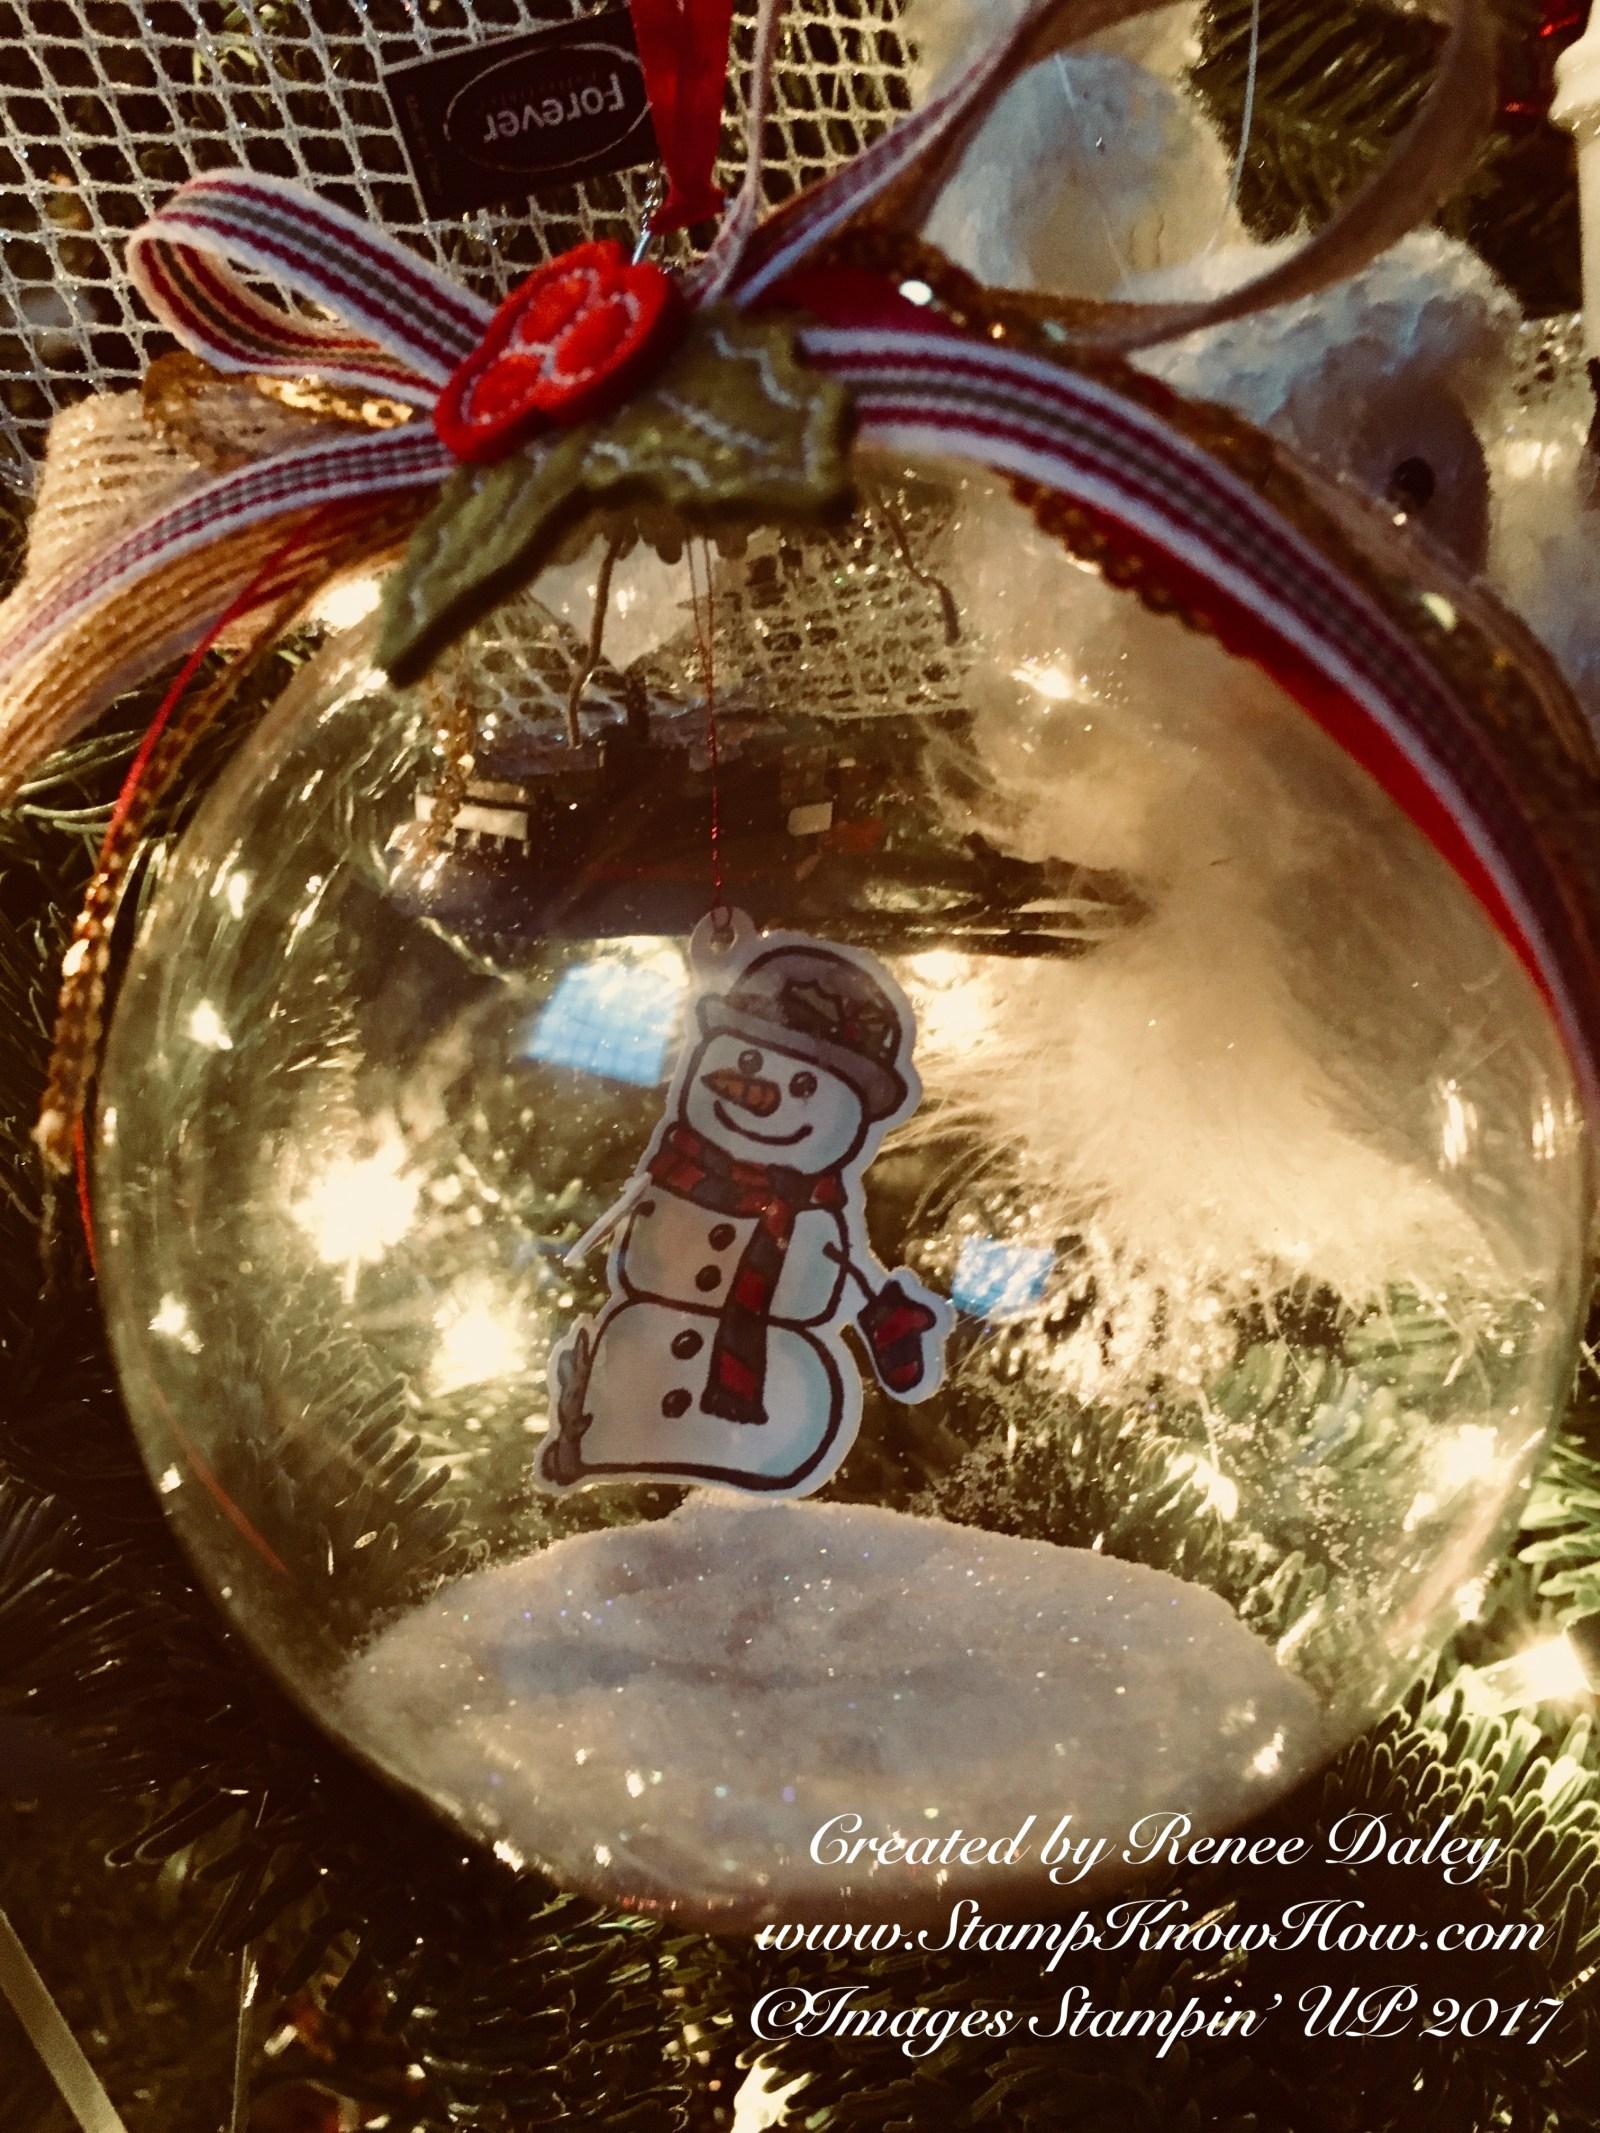 Seasonal Chums Ornament on Christmas tree